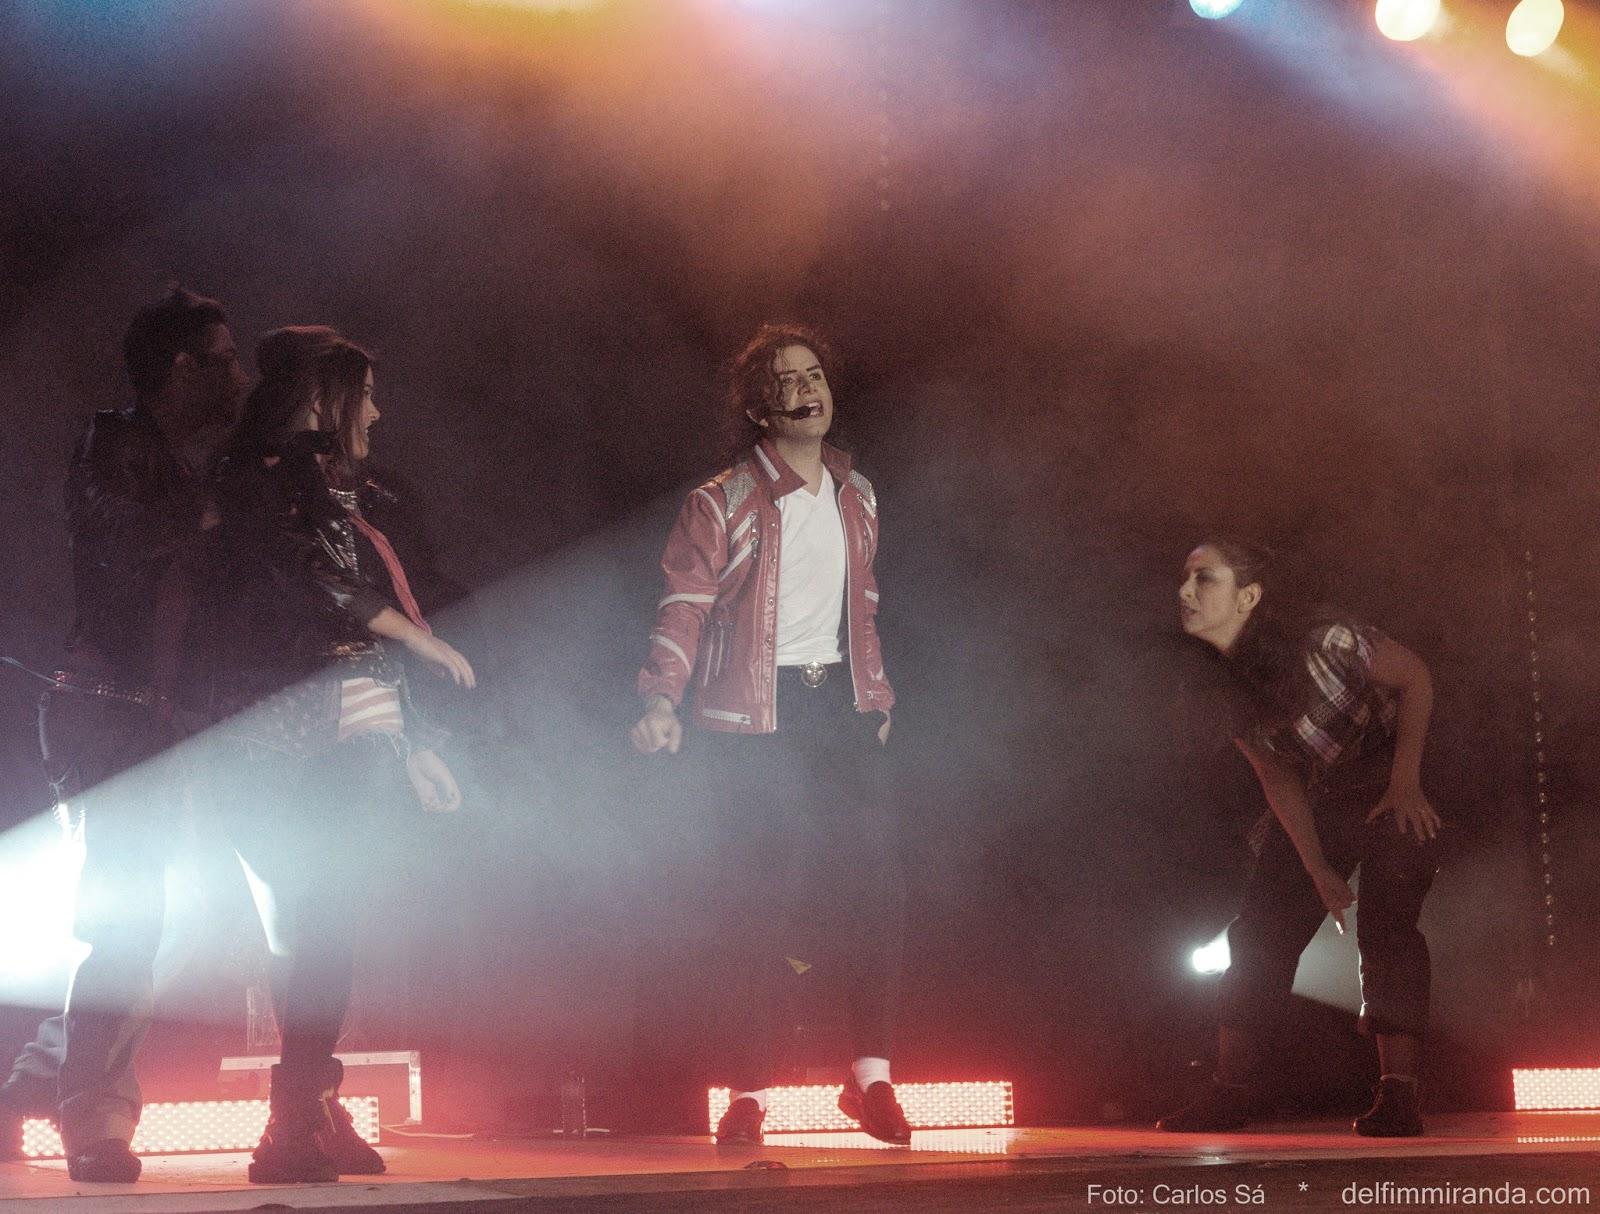 Delfim Miranda - Michael Jackson Tribute - Beat It - Live Performance